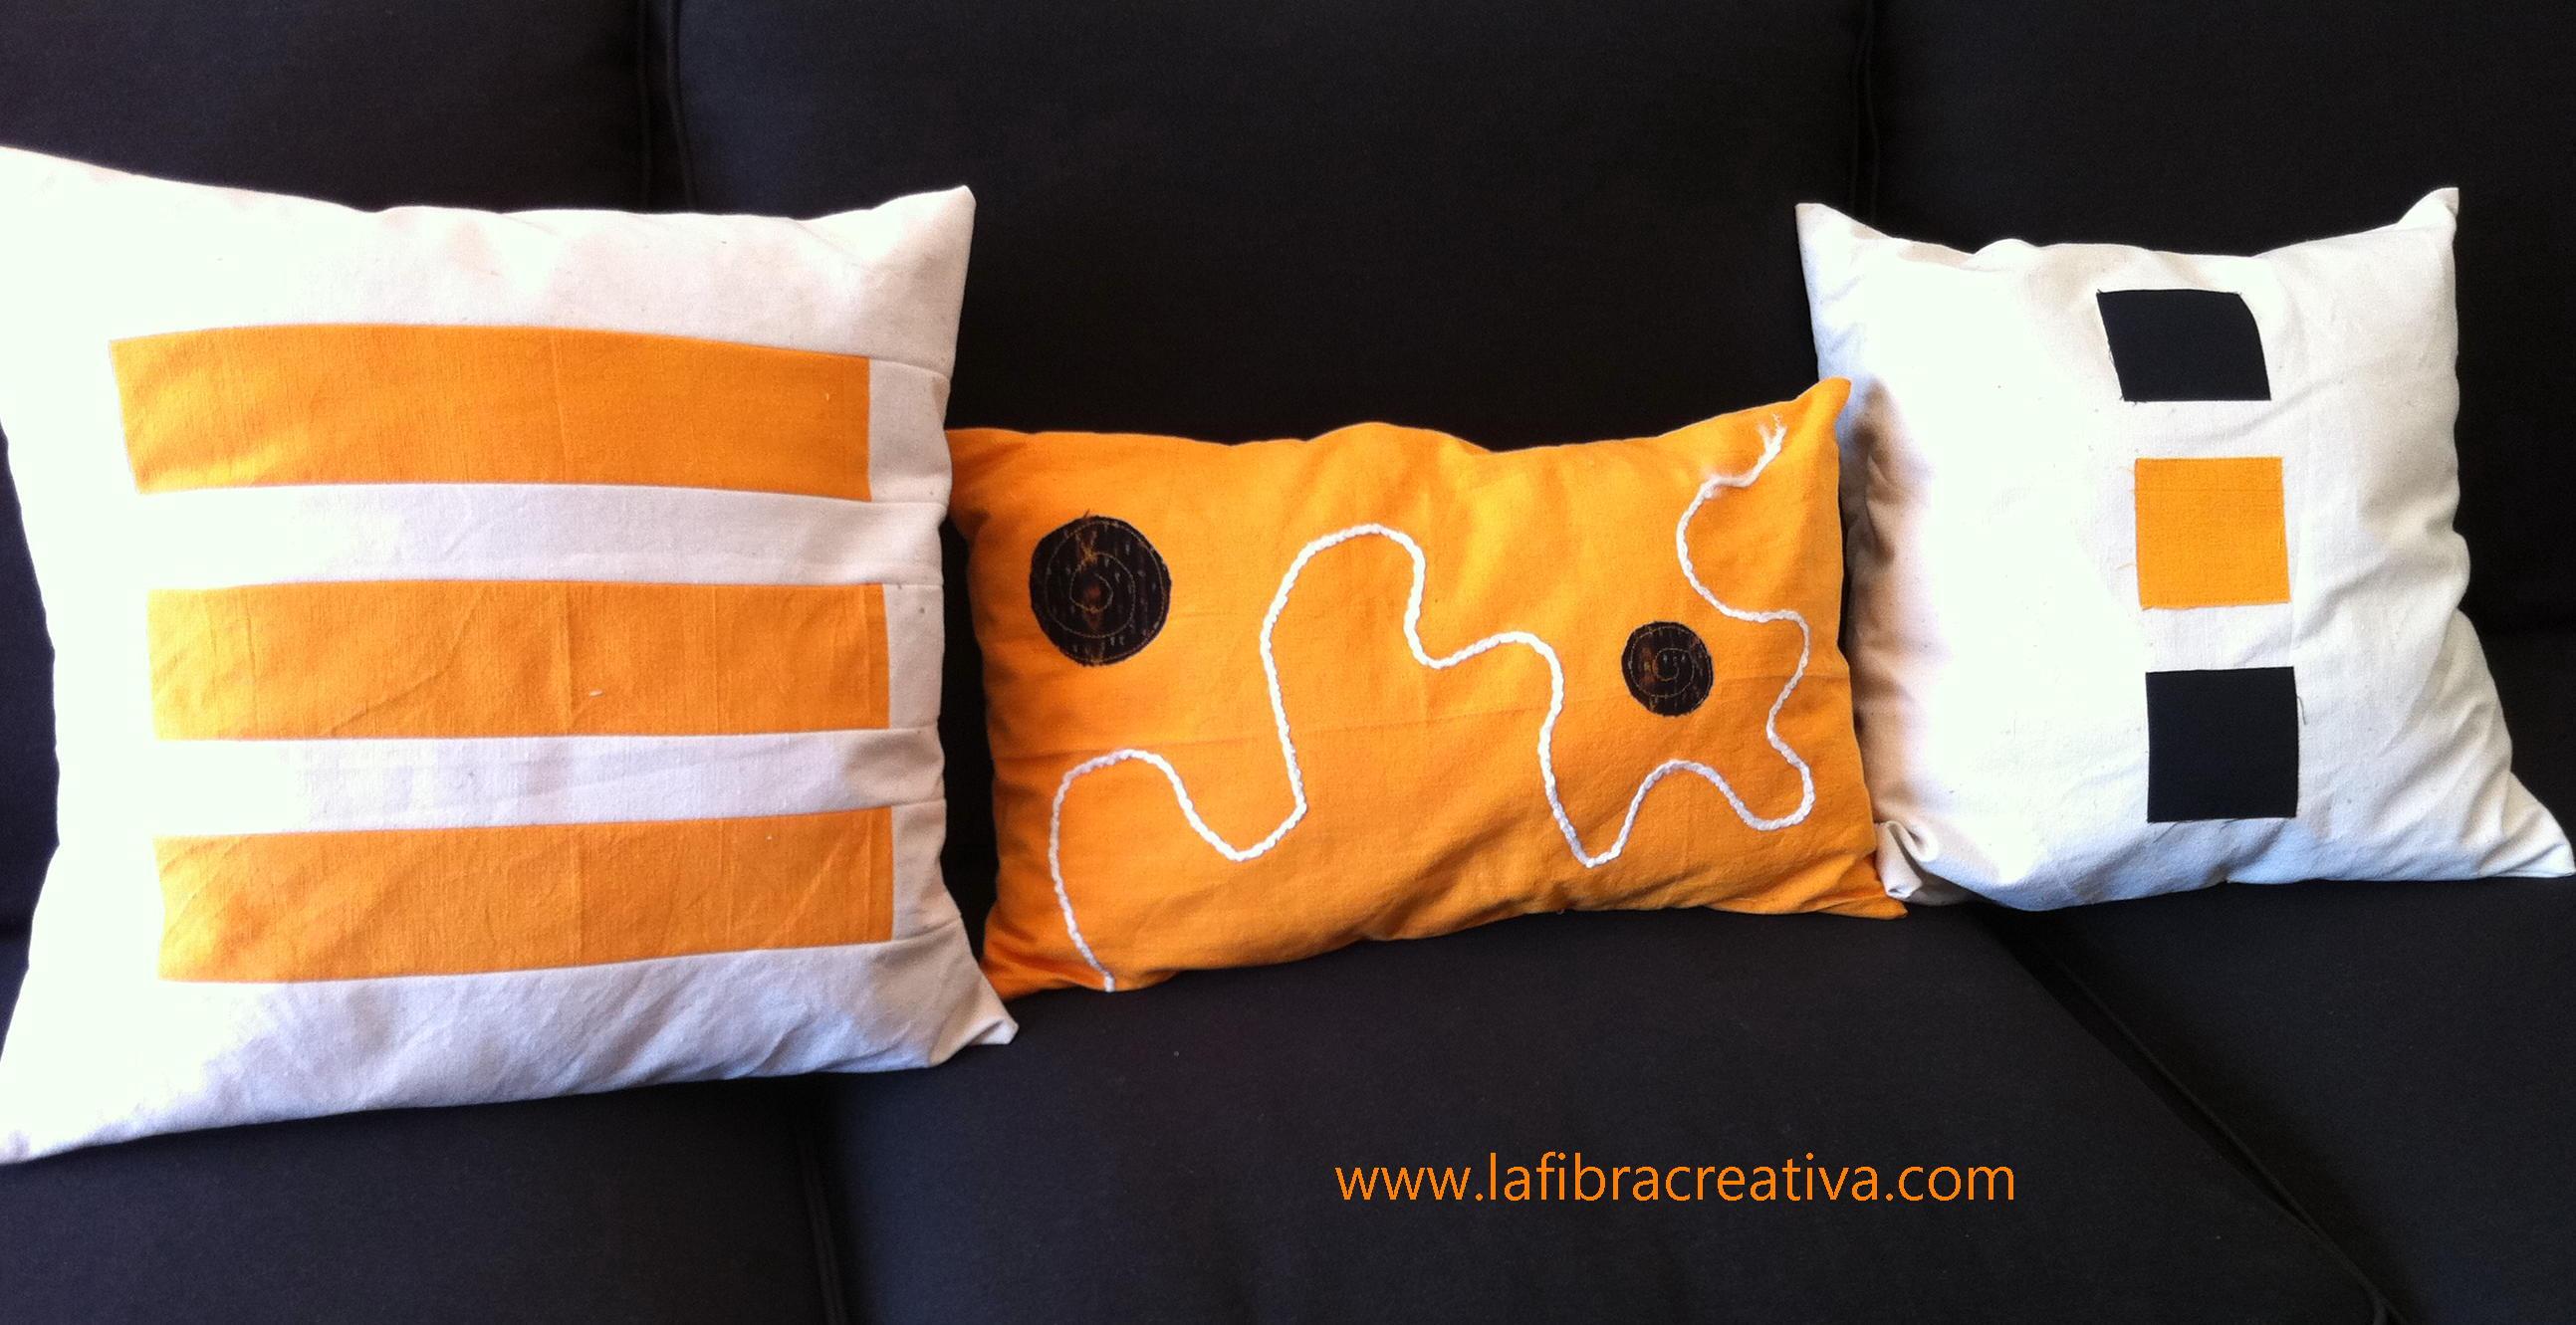 Cojines patchwork moderno en blanco, naranja y negro